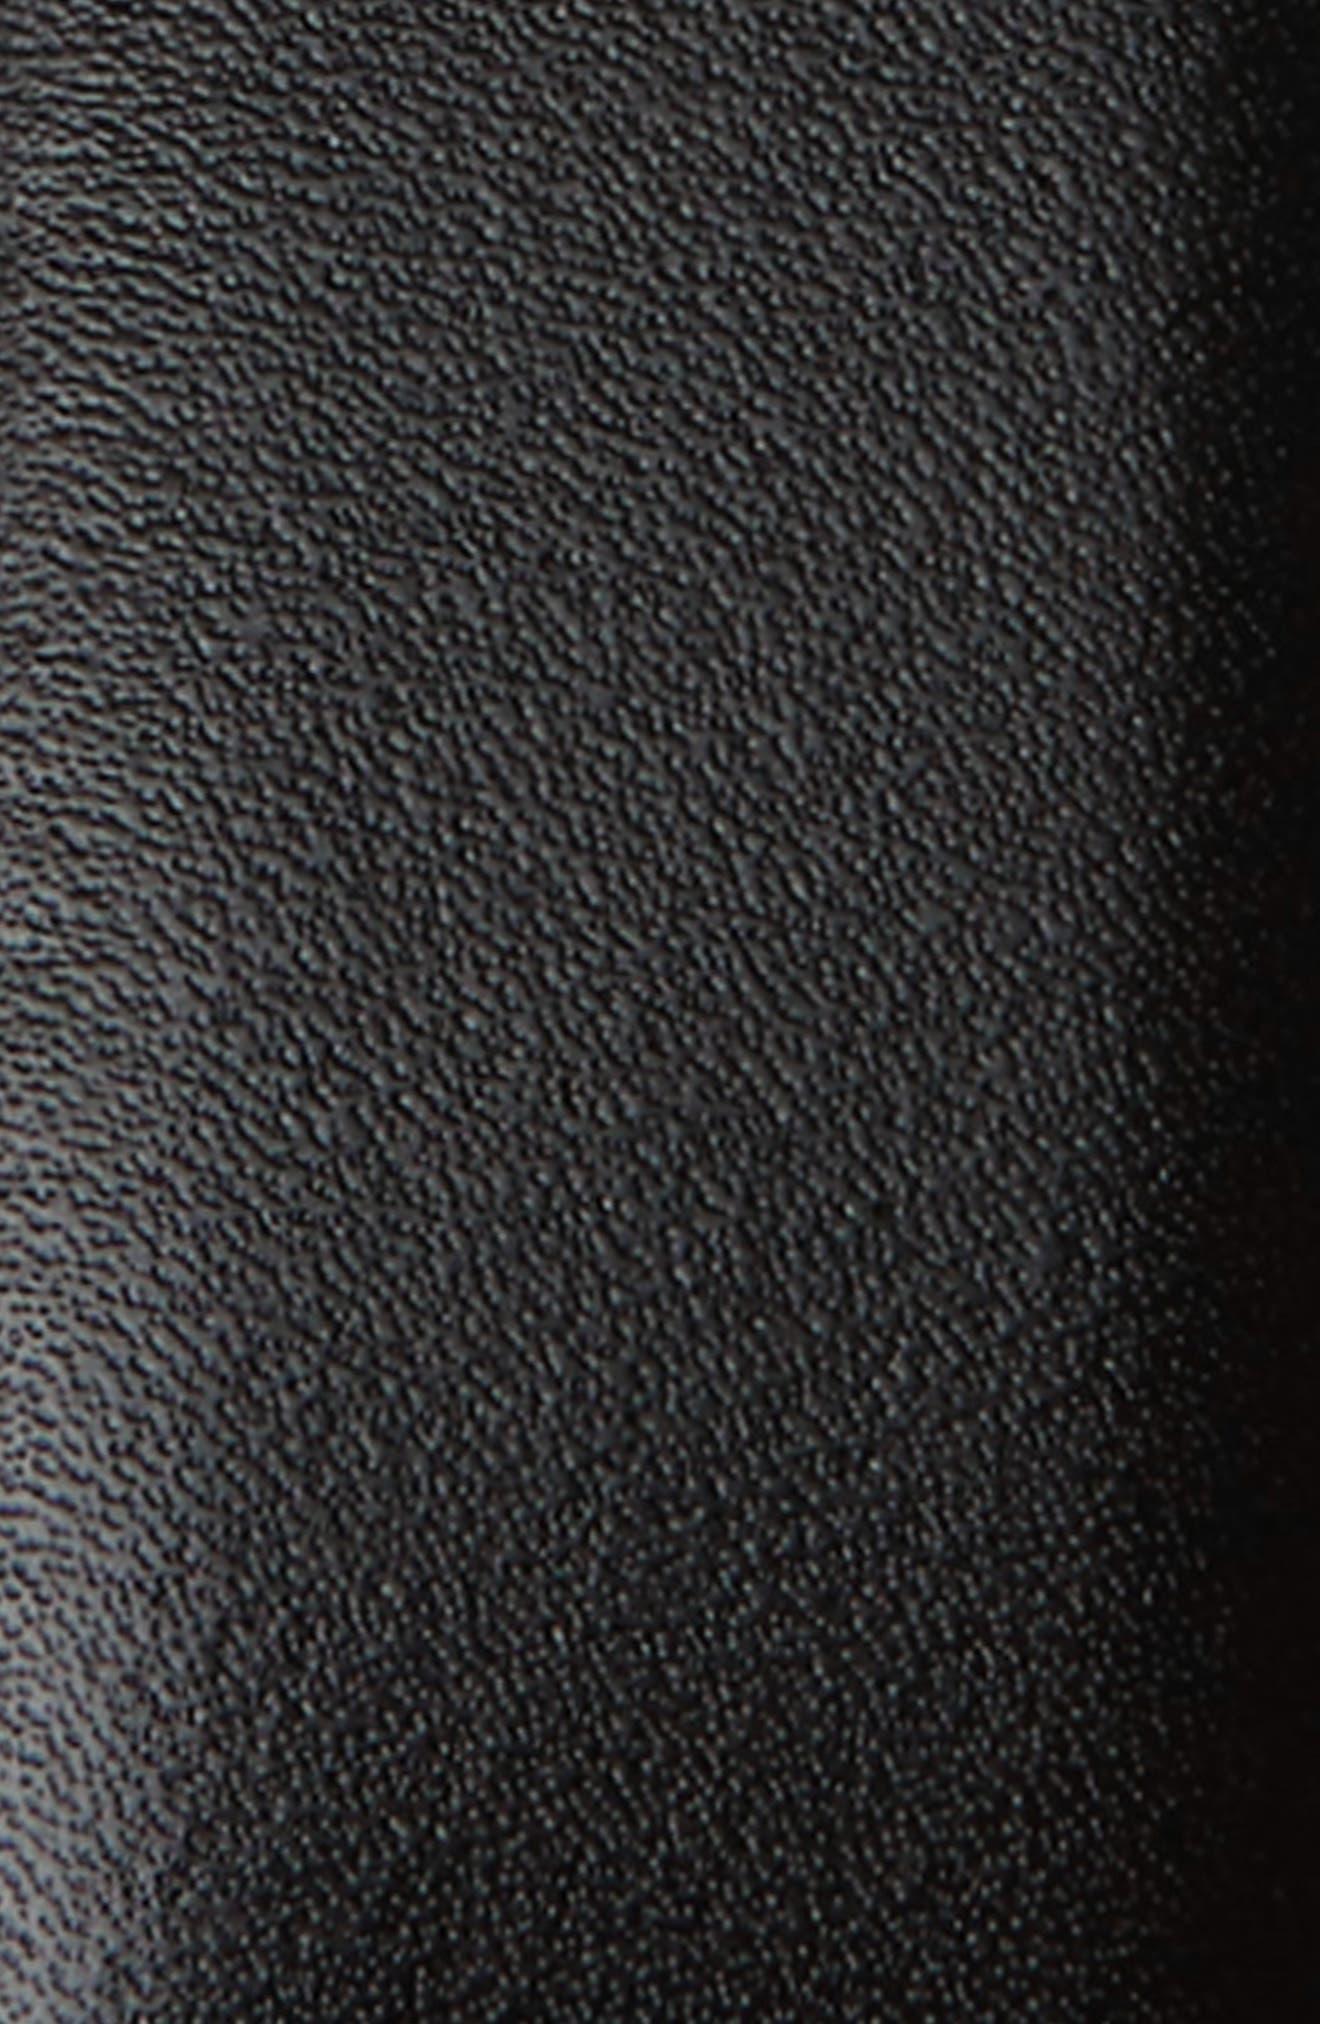 Meisterstück Buckle Reversible Leather Belt,                             Alternate thumbnail 3, color,                             Black/ Brown